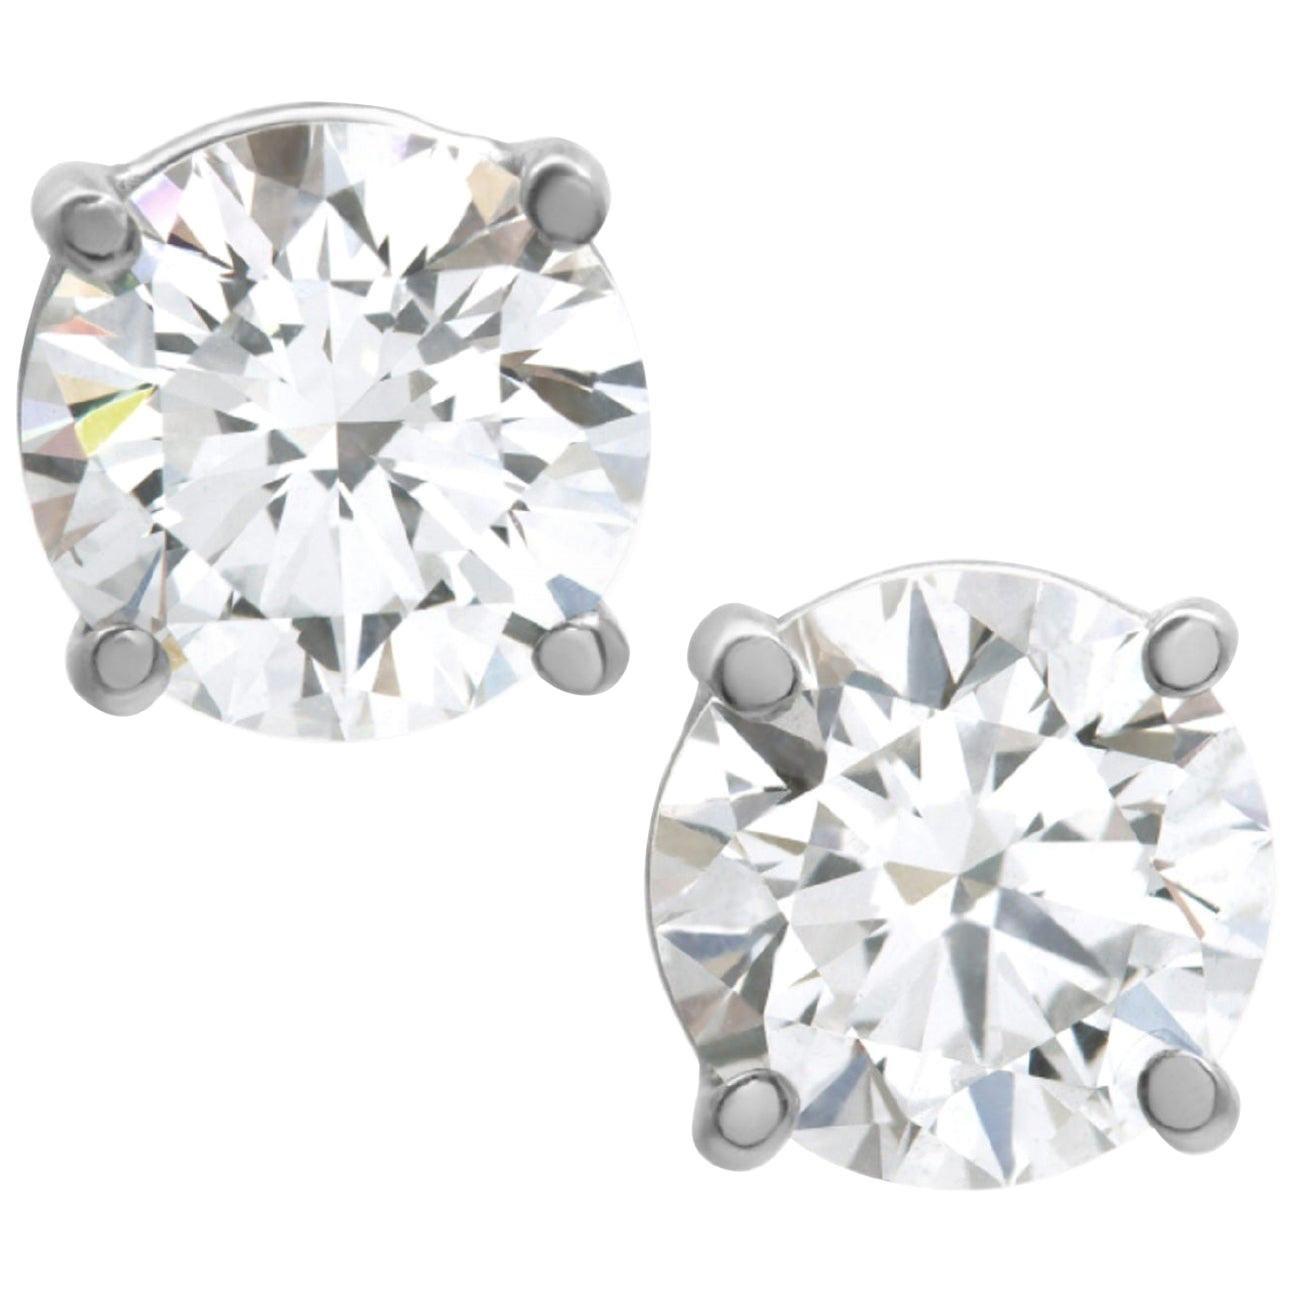 Internally Flawless D Color GIA Certified 3 Carat Diamond Studs